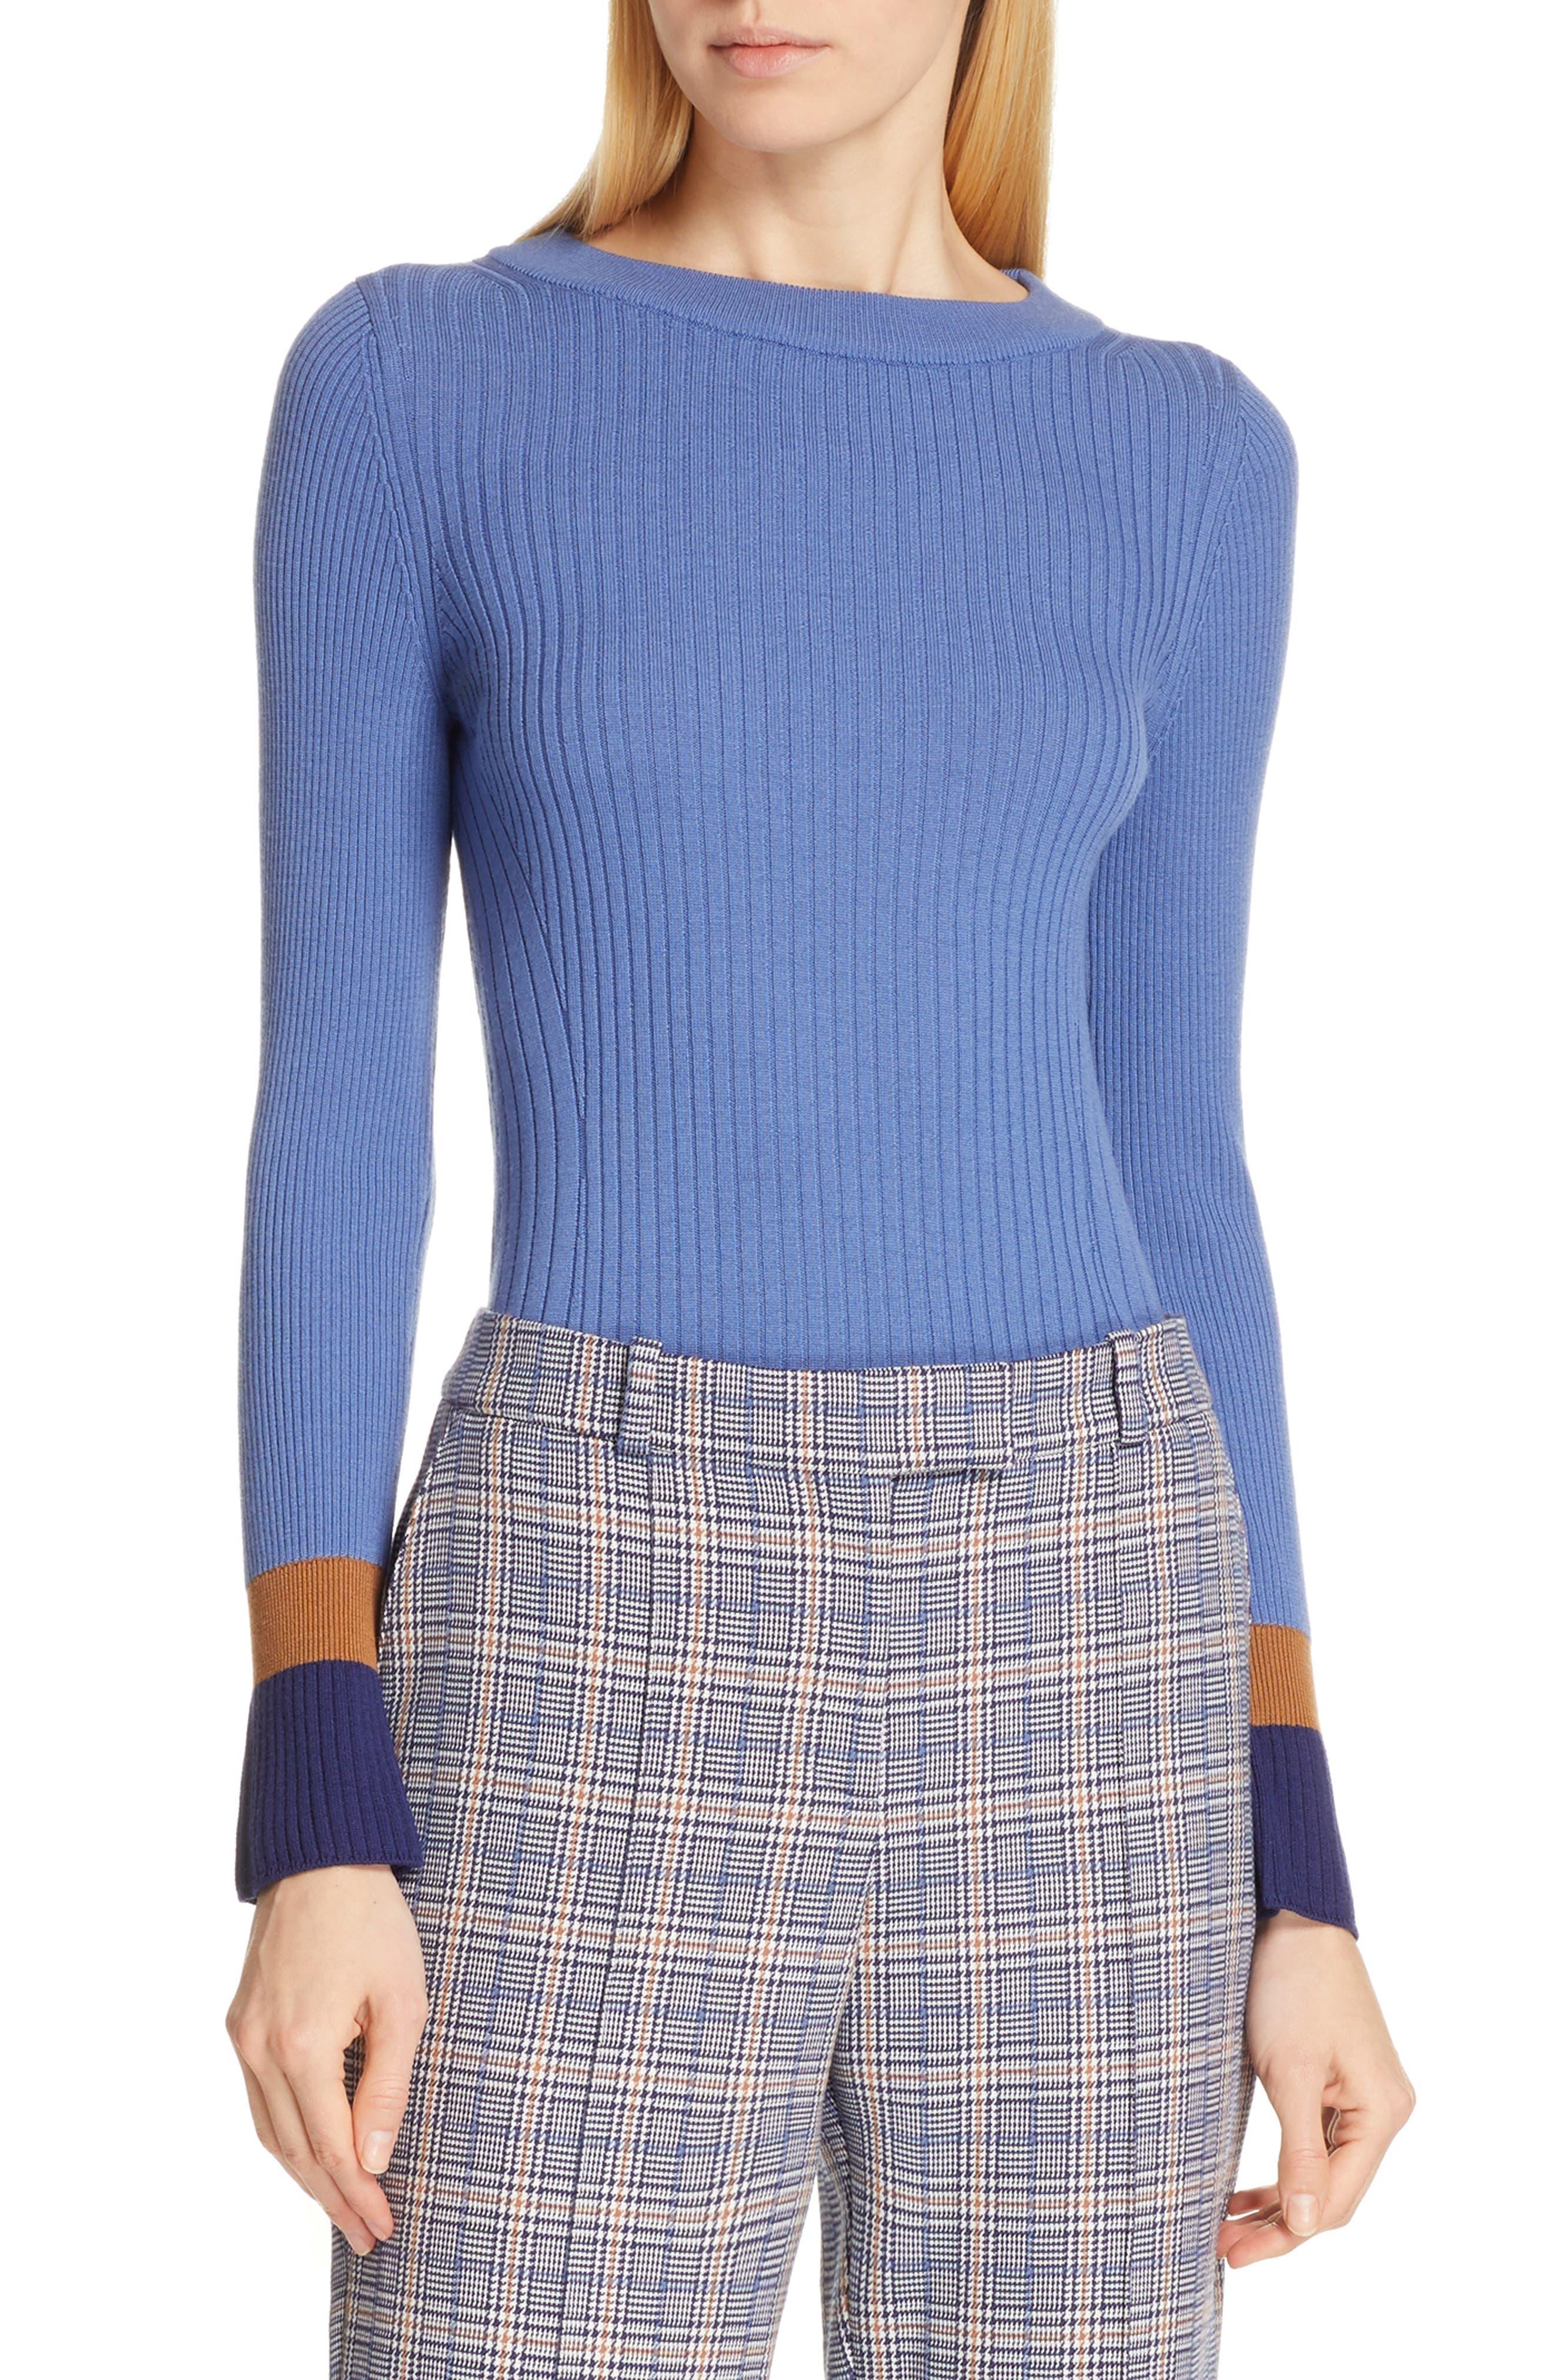 Fadeline Blue Fantasy Ribbed Wool Sweater, Main, color, SOFT BLUE FANTASY